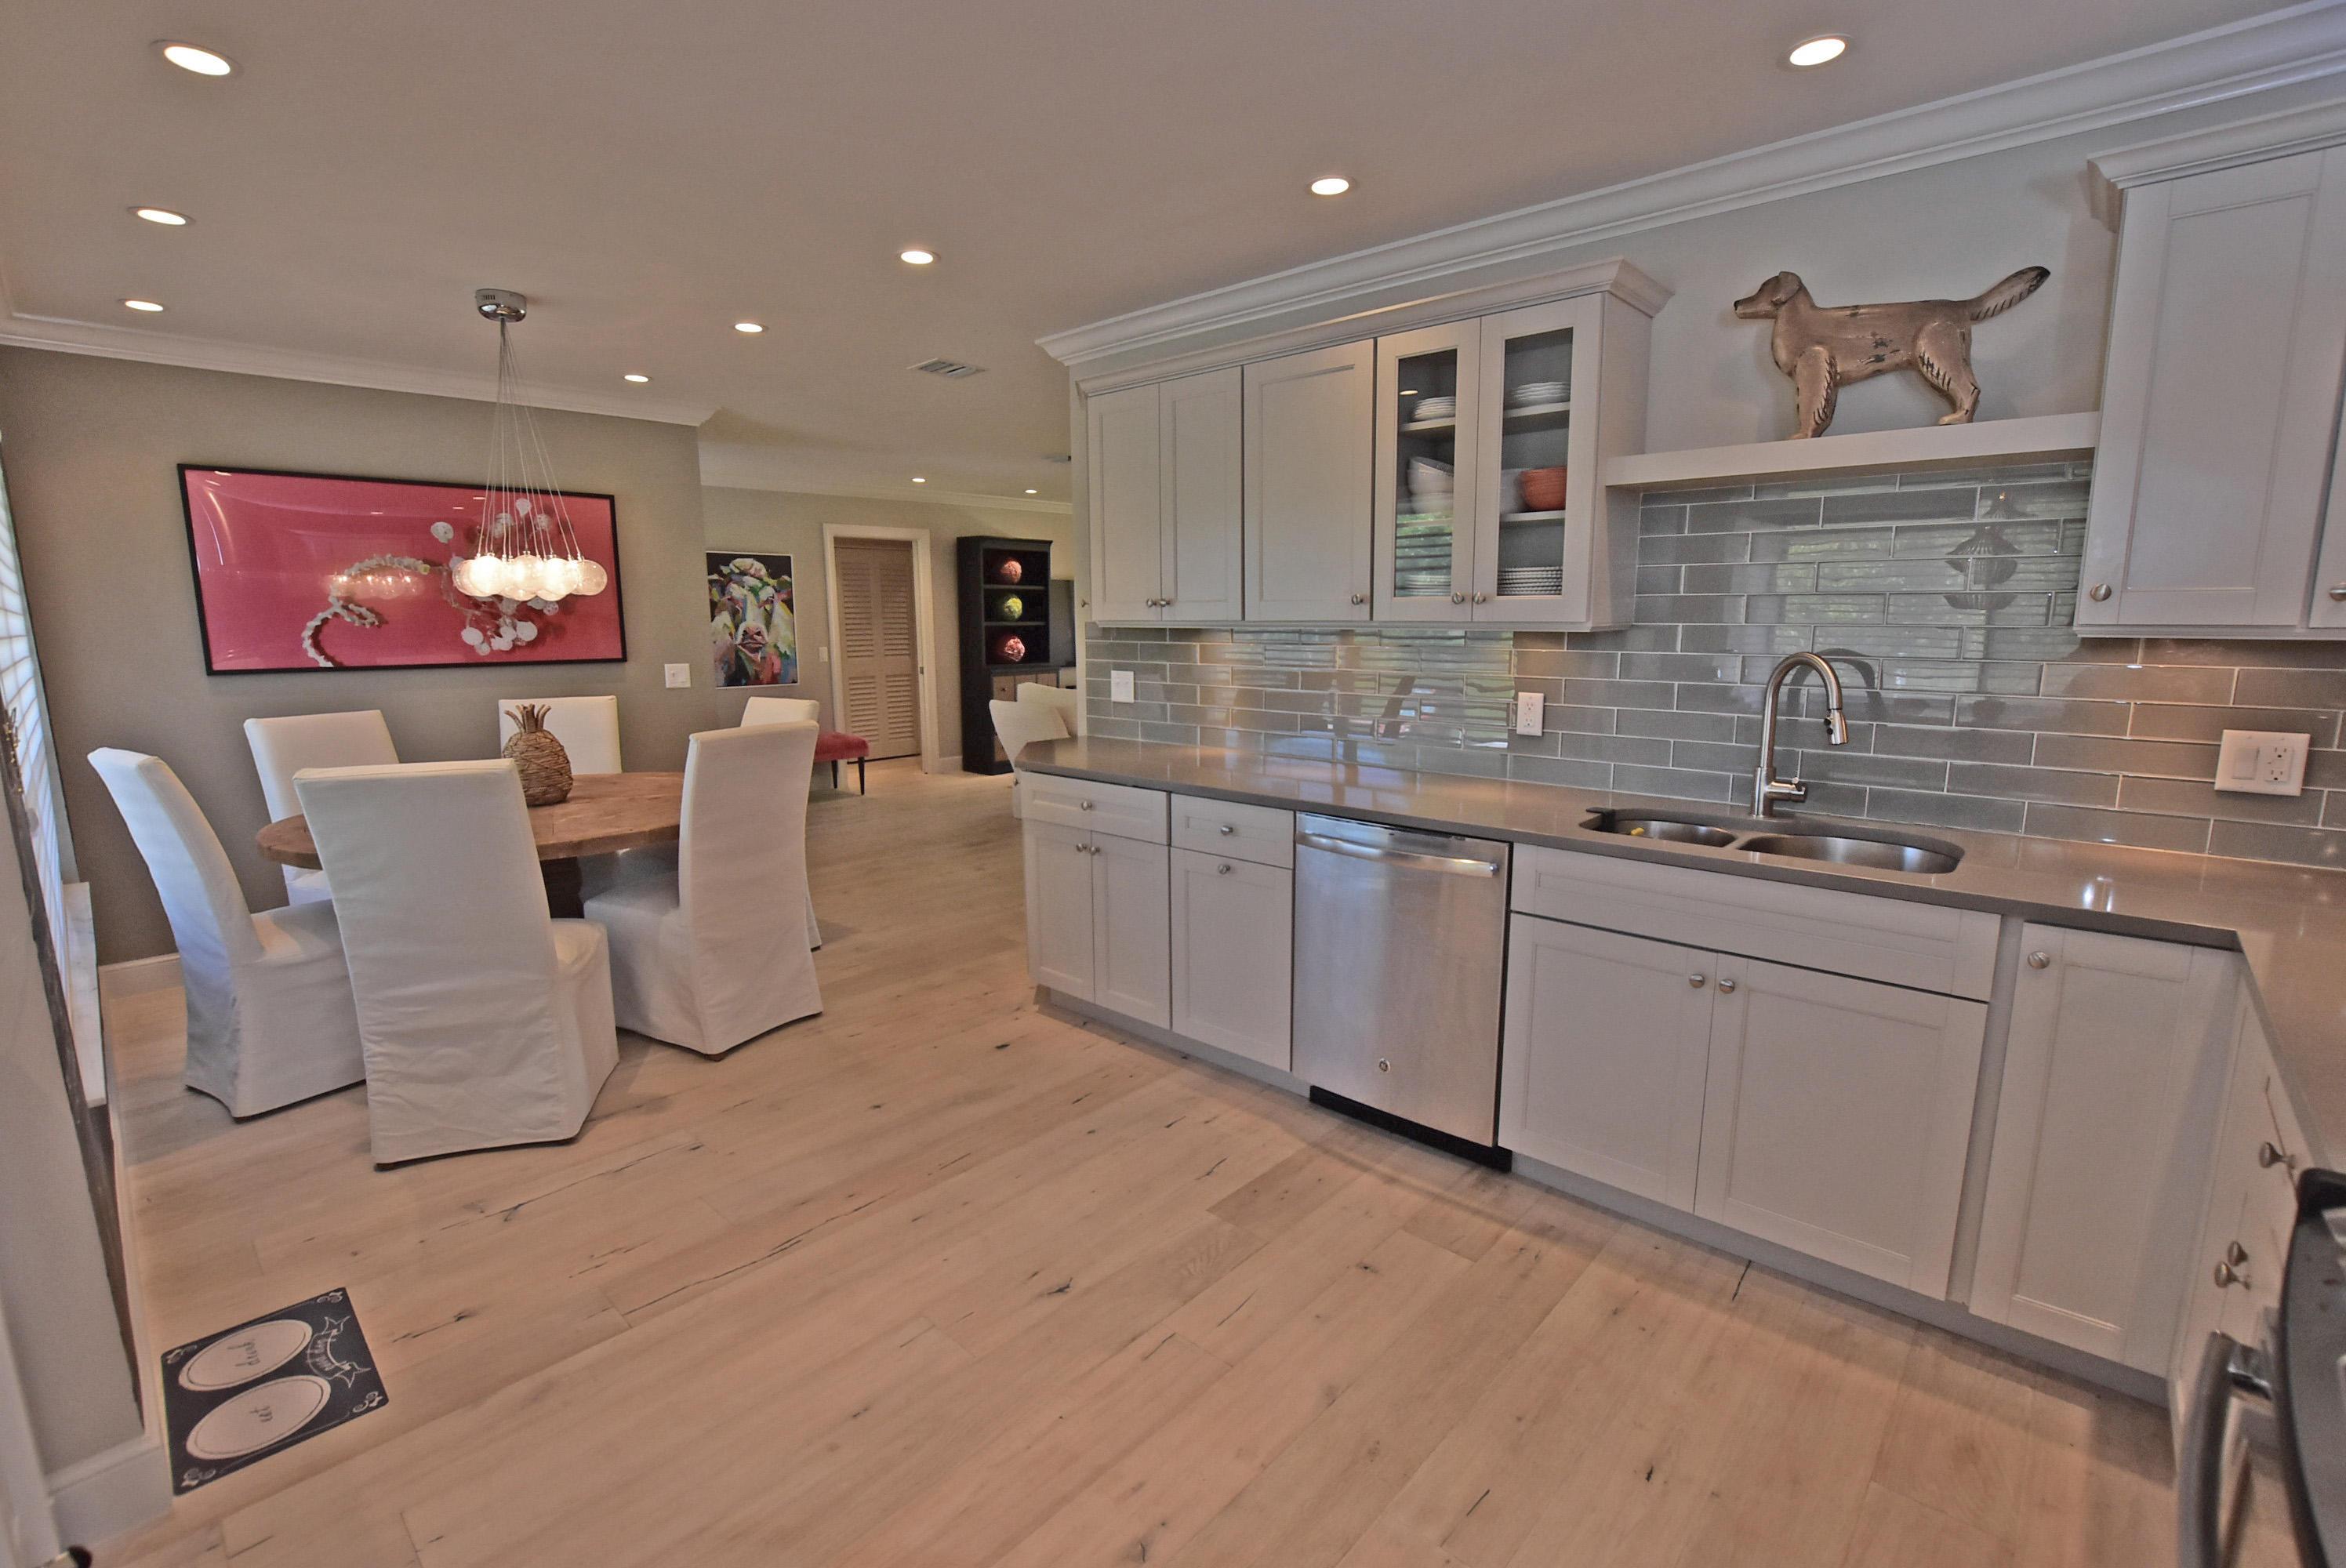 10181 Quail Covey Road Hibiscus N, Boynton Beach, Florida 33436, 3 Bedrooms Bedrooms, ,2 BathroomsBathrooms,A,Condominium,Quail Covey,RX-10560544